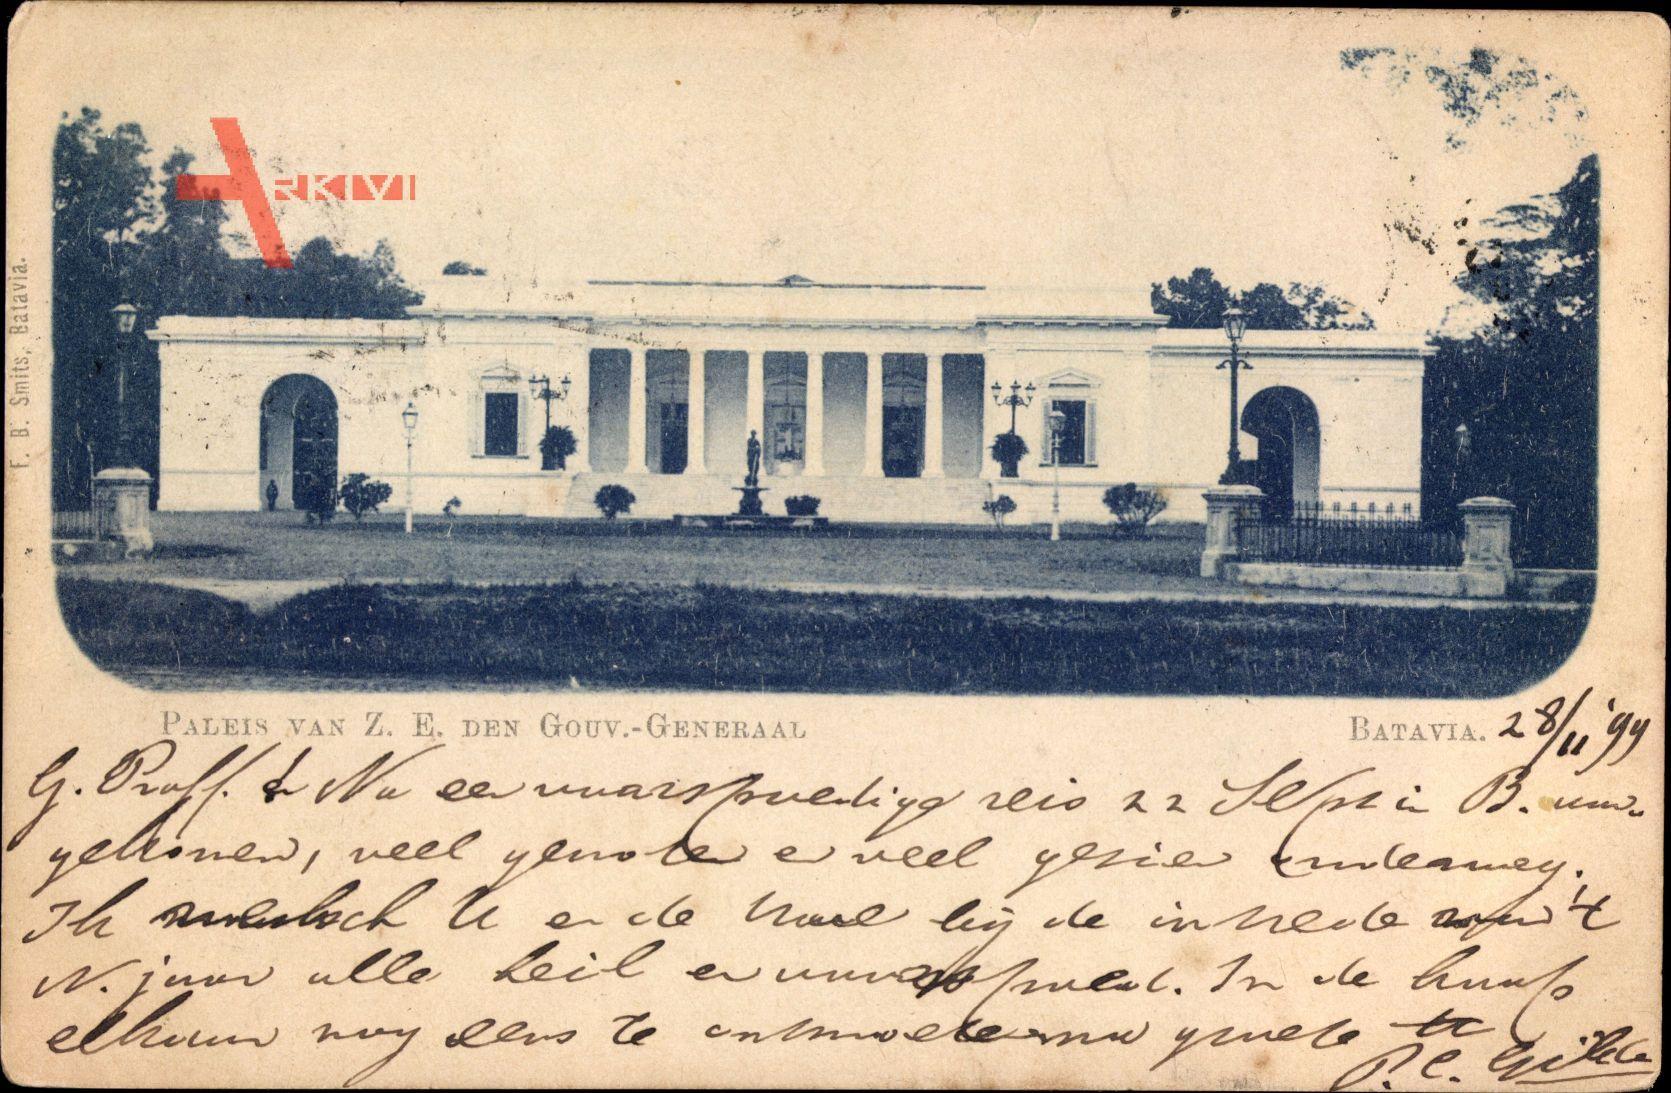 Batavia Jakarta Indonesien, Paleis van Z. E. den Gouv. Generaal